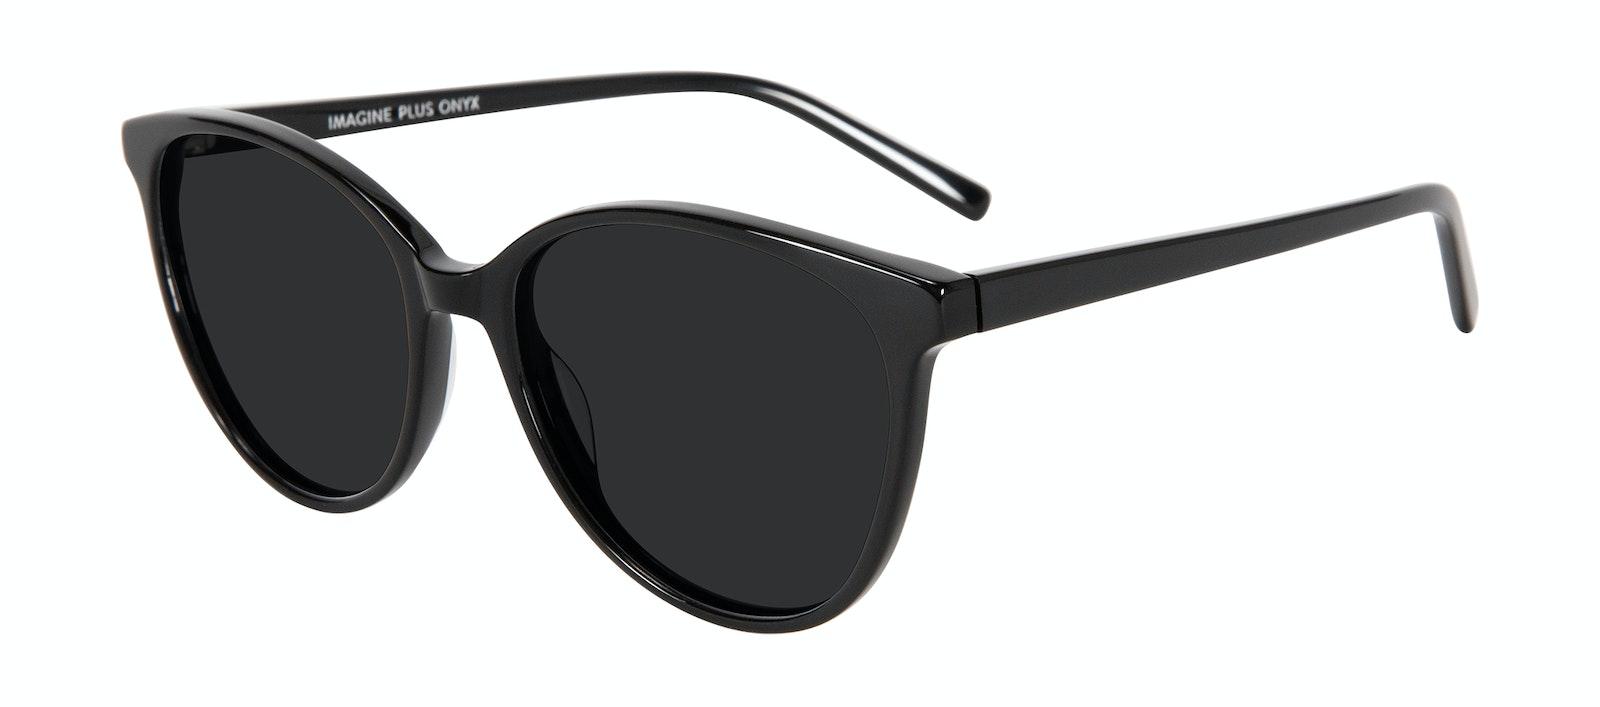 Affordable Fashion Glasses Cat Eye Sunglasses Women Imagine Plus Onyx Tilt